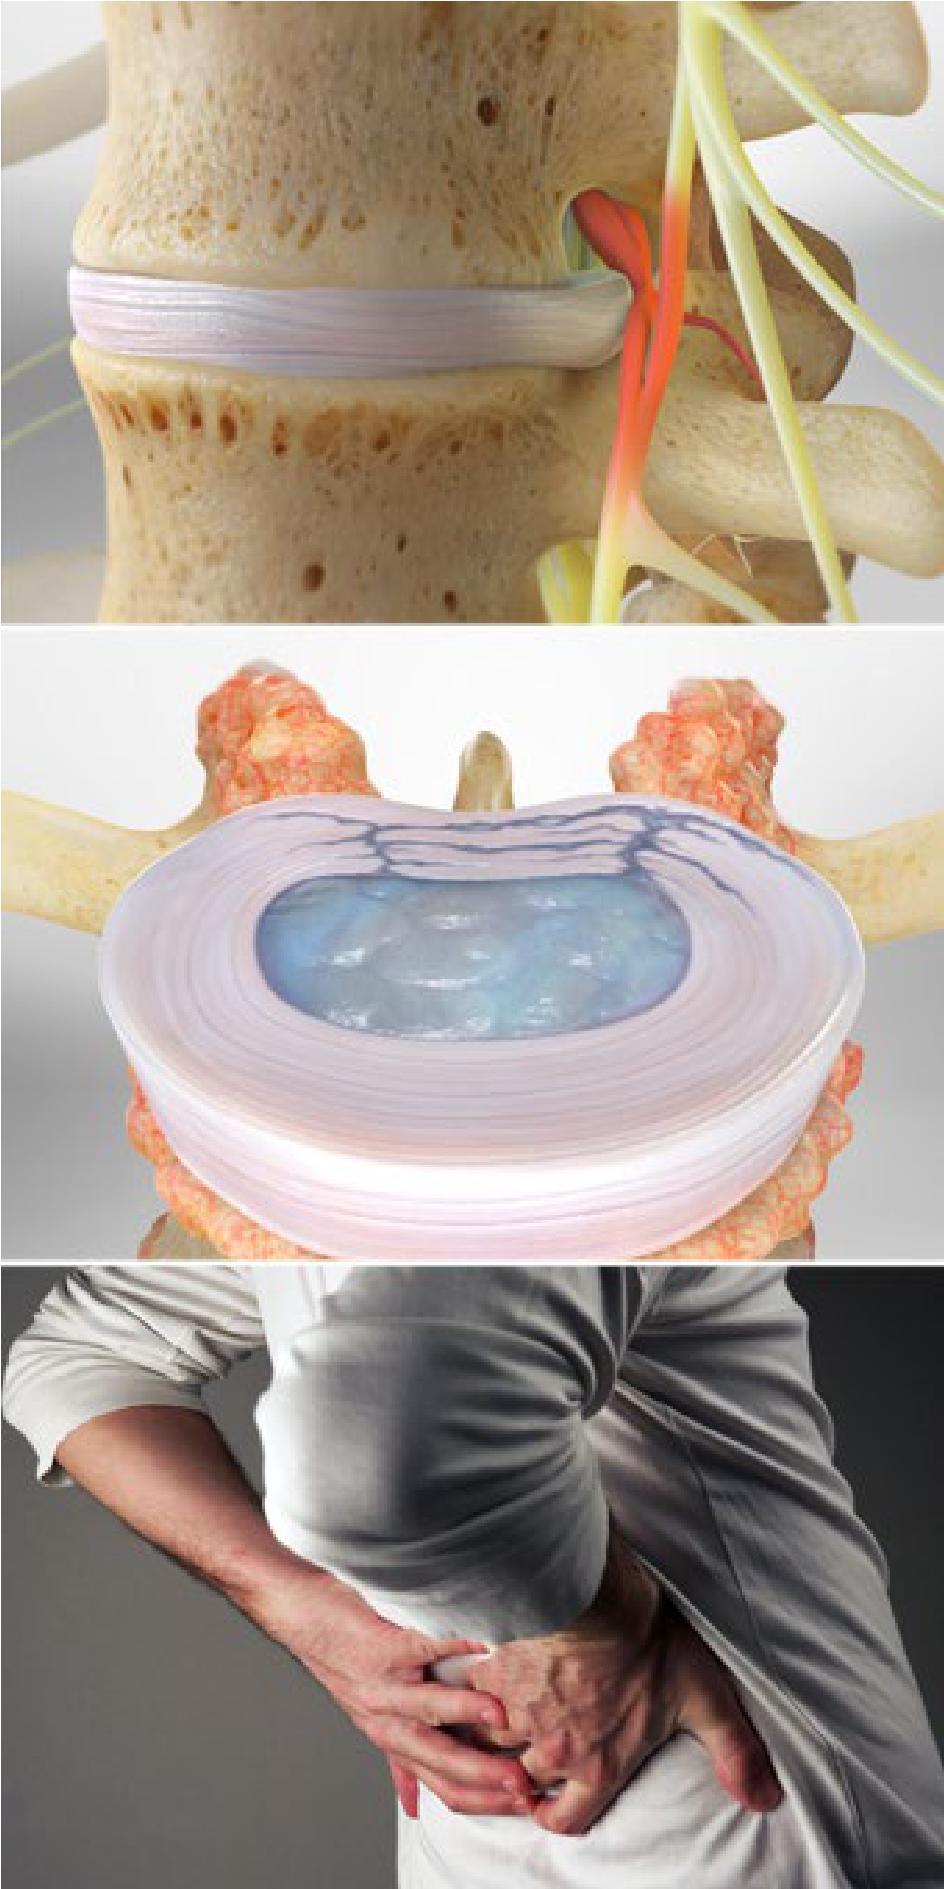 Herniated Discs Show Low AZ | Herniated Disc Treatment